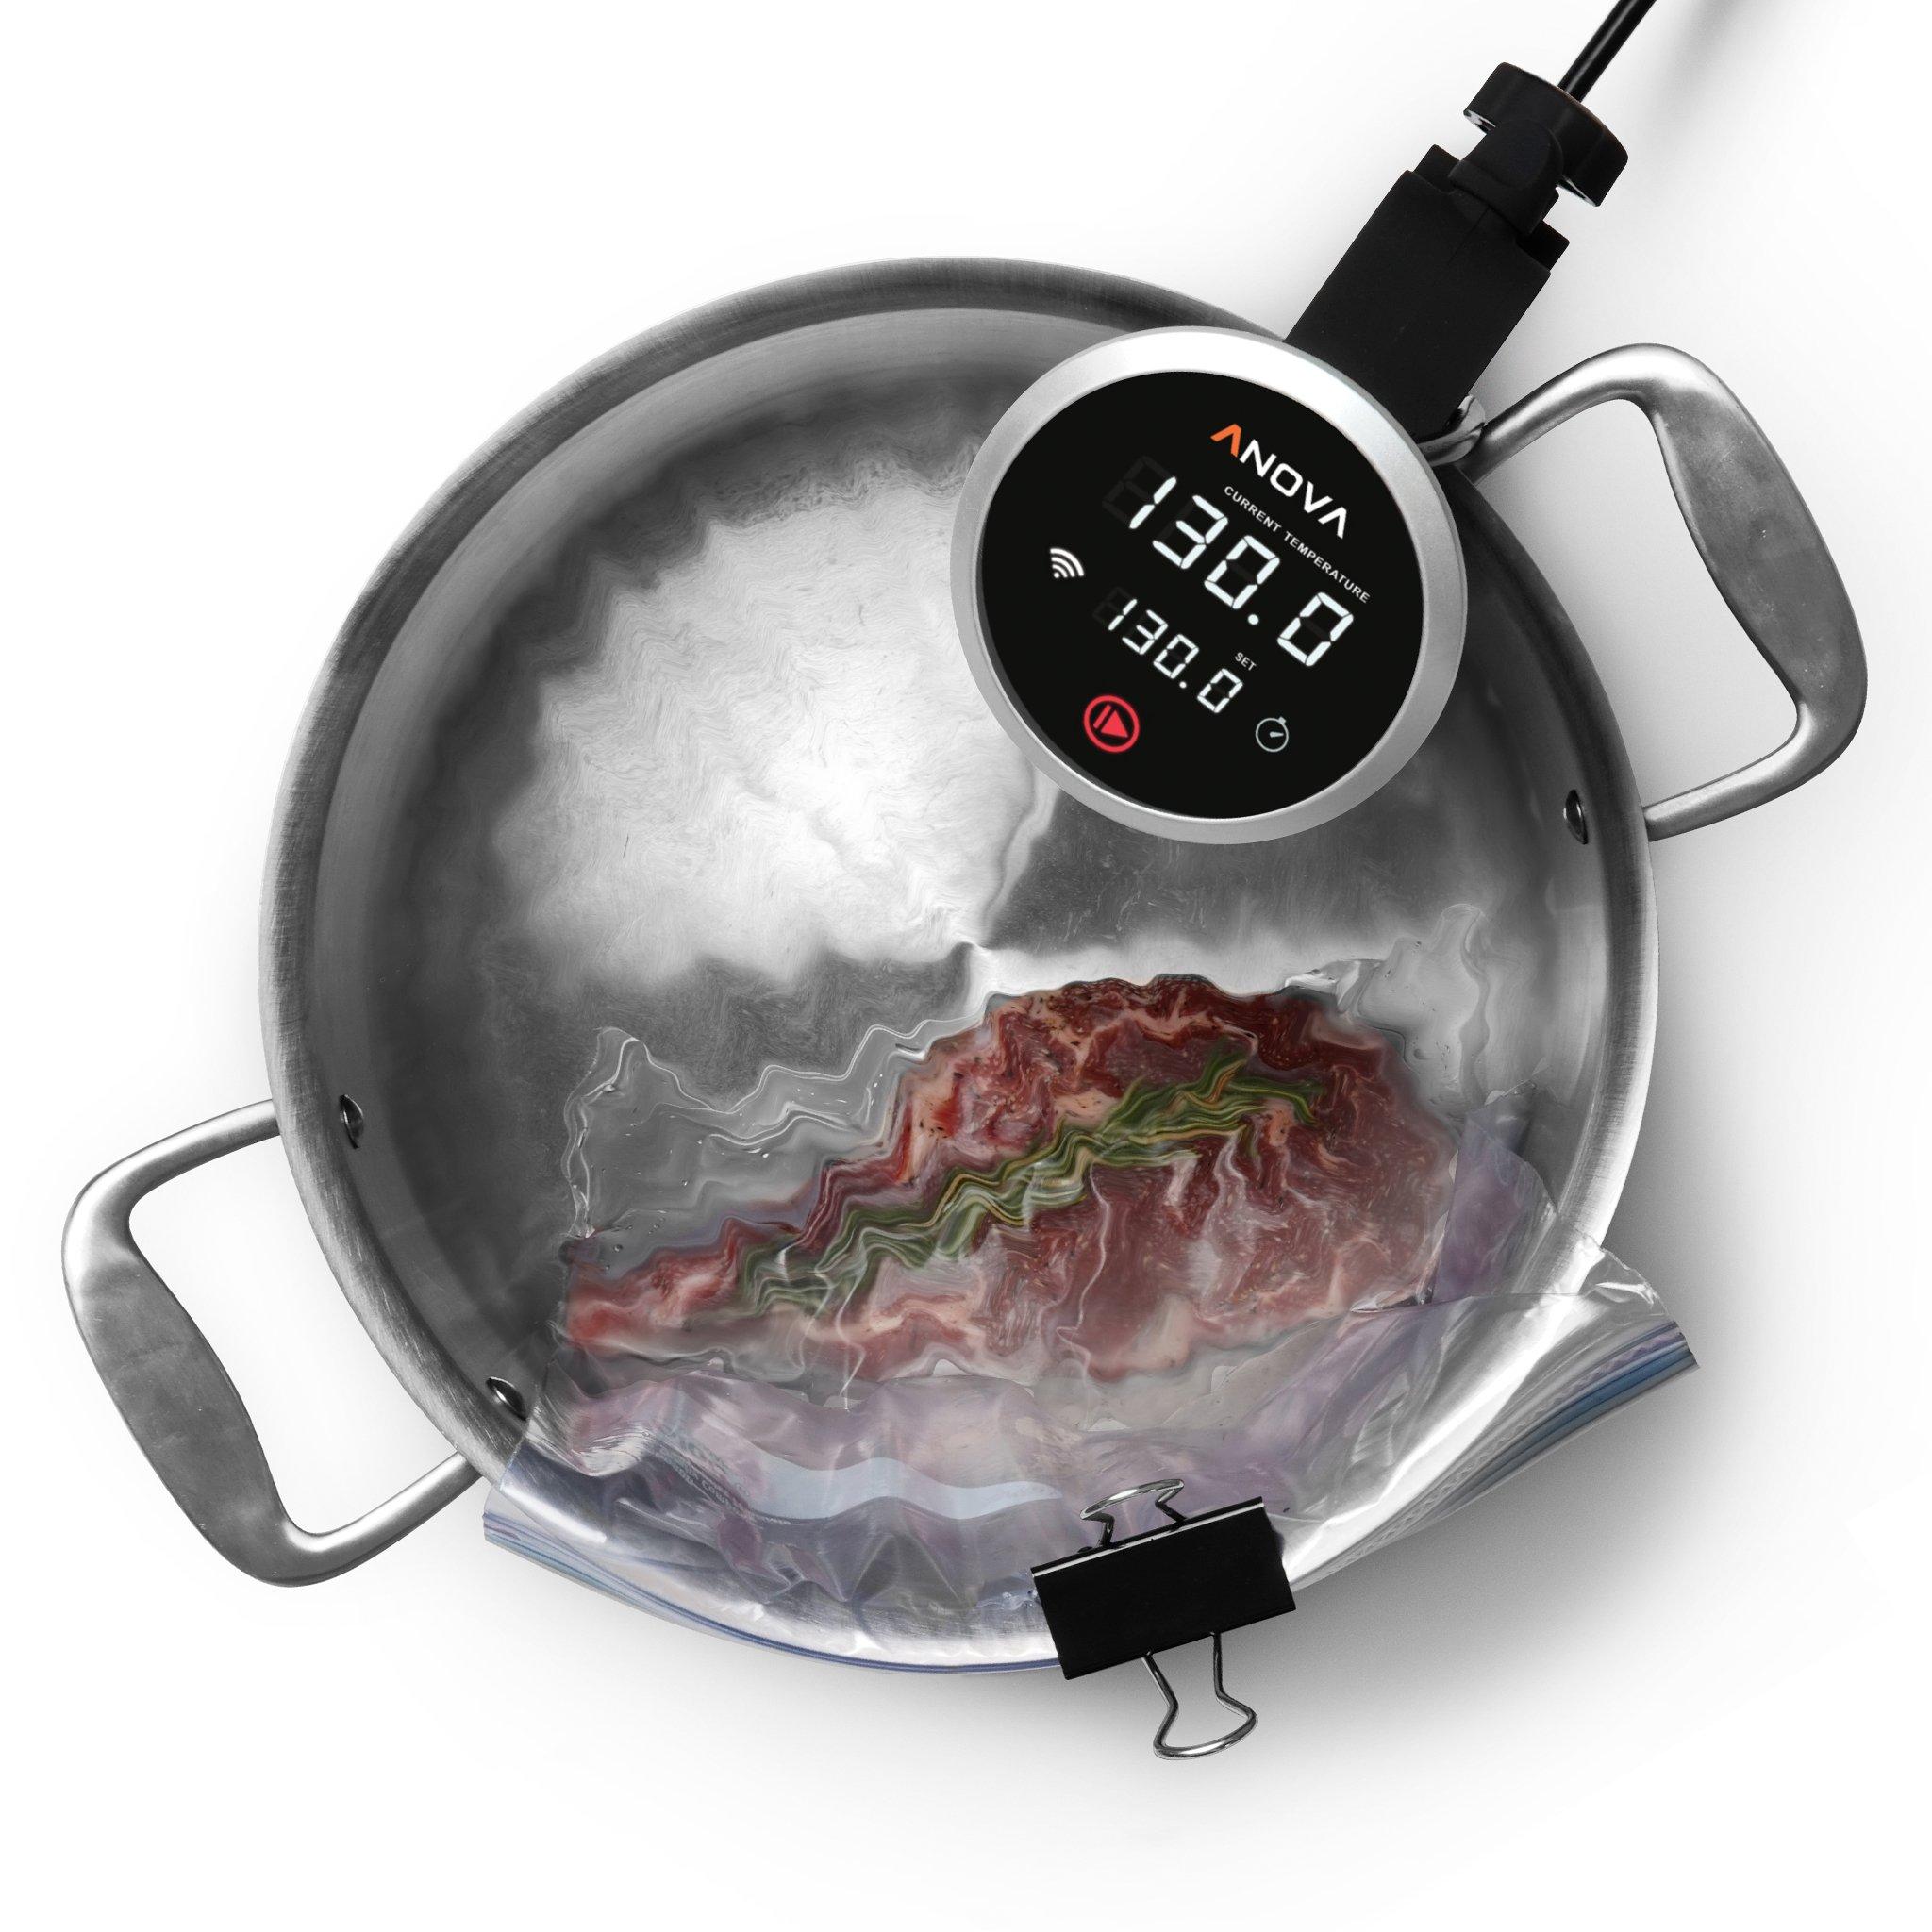 Anova Culinary Sous Vide Precision Cooker WIFI, Immersion Circulator (2nd Gen), 900 Watts, Black by Anova Culinary (Image #5)